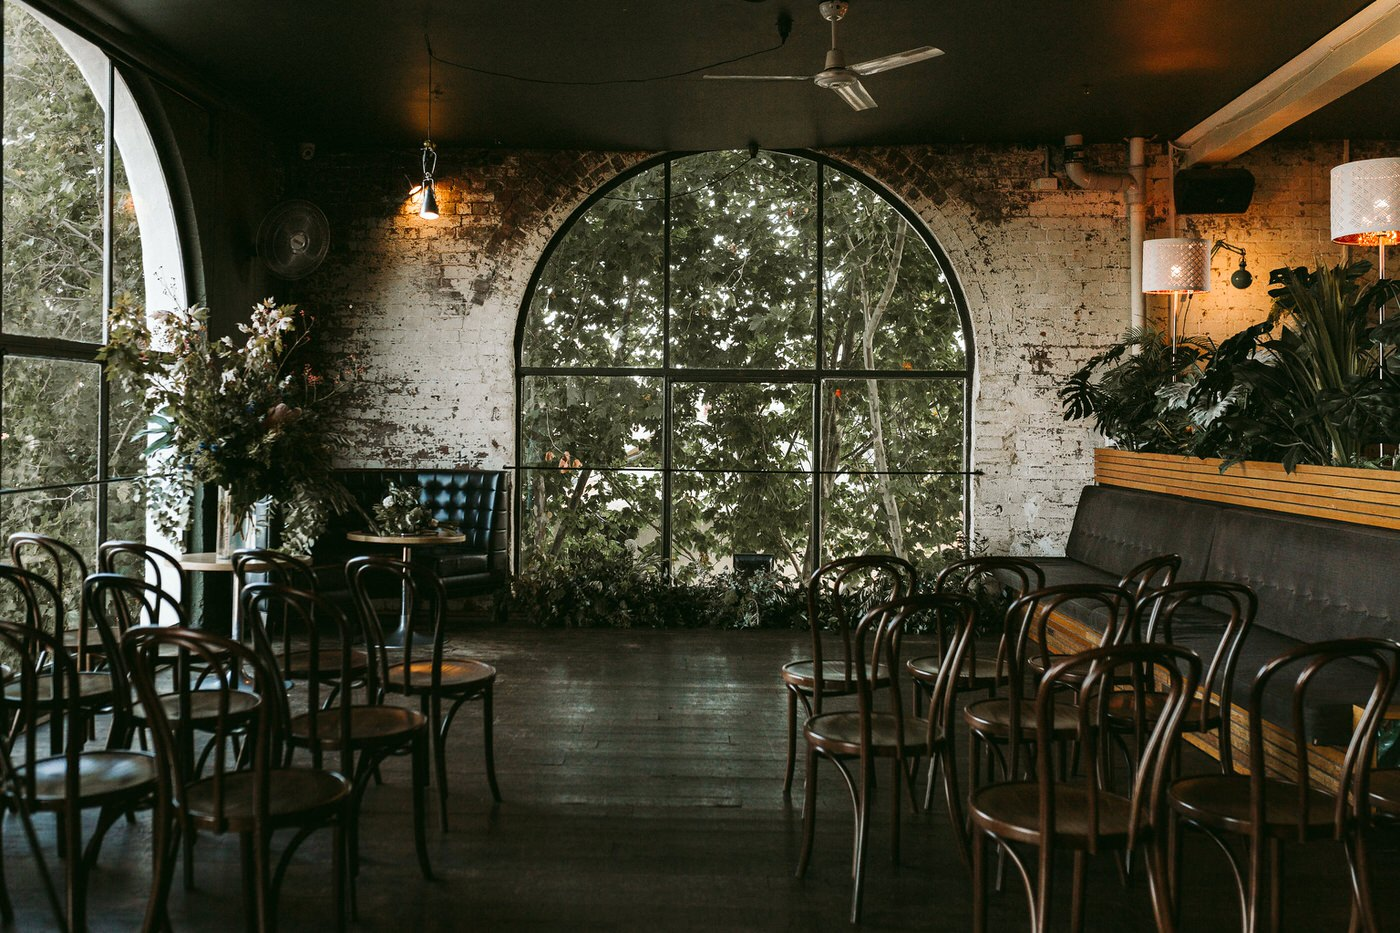 GoldandGrit_KimMatt_Panama-Dining-Room-Fitzroy-Collingwood-Relaxed-Fun-Candid-Wedding-Photography_64.jpg